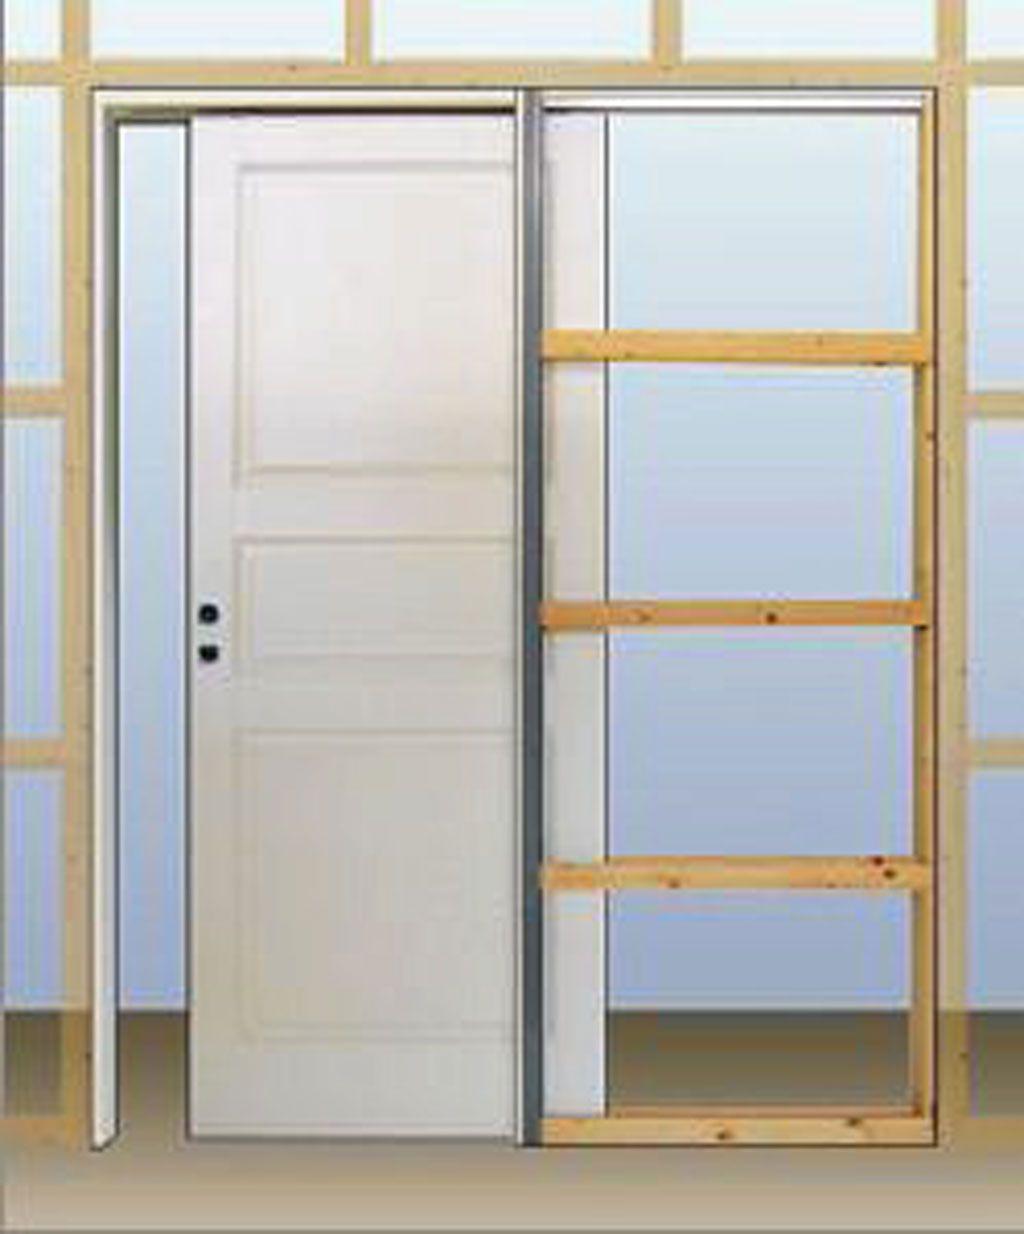 Infälld skjutdörr | Kök - önskelista | Pinterest | Sovrum ... : bygga garderob skjutdörrar : Garderob